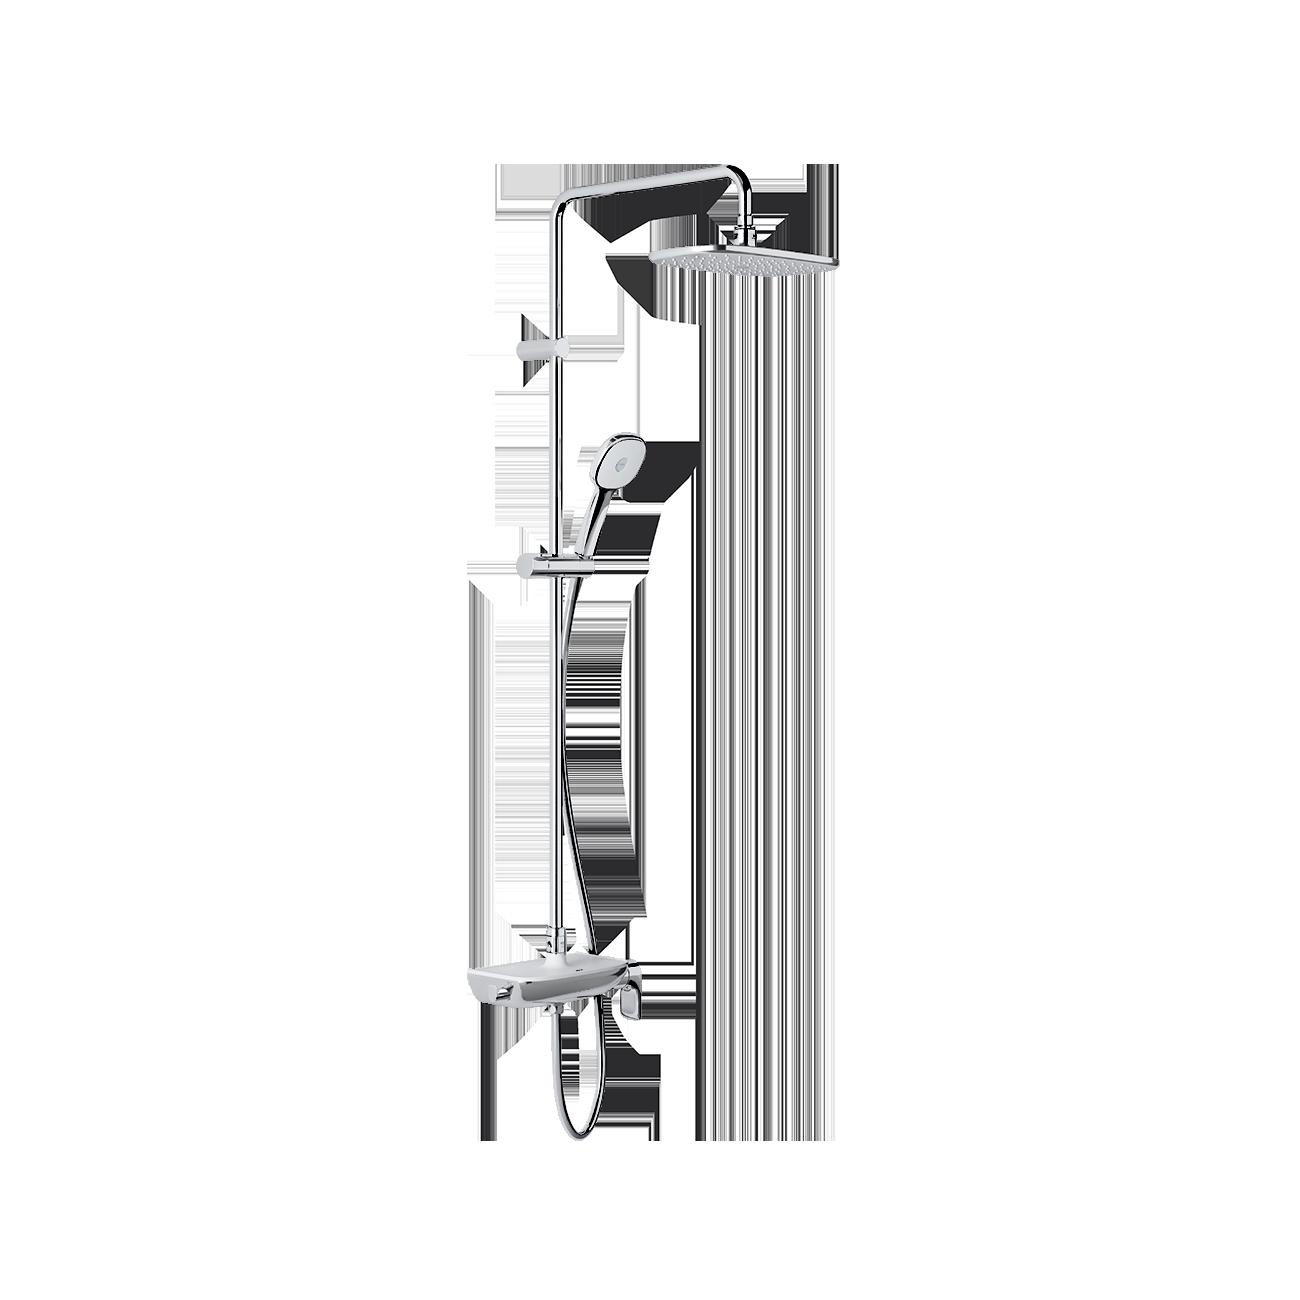 Bộ sen tắm cây INAX BFV-615S-8C